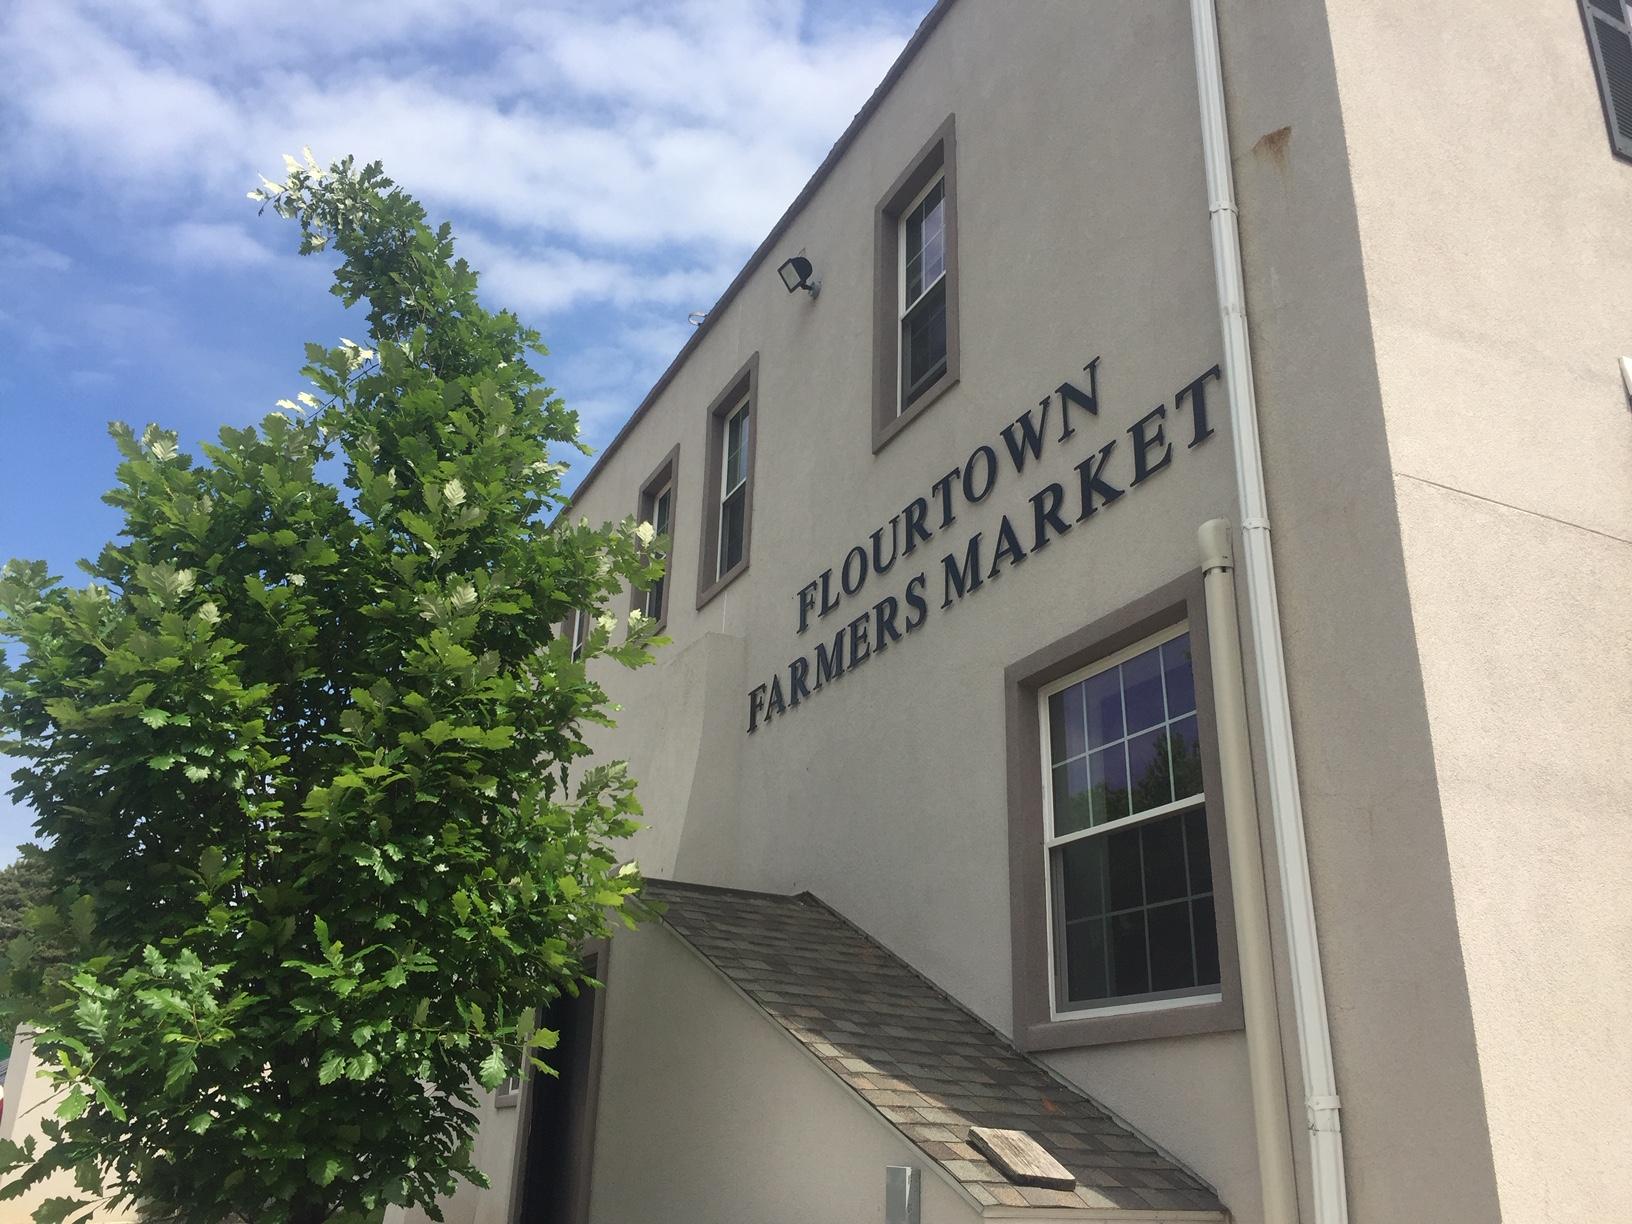 Flourtown Farmers Market